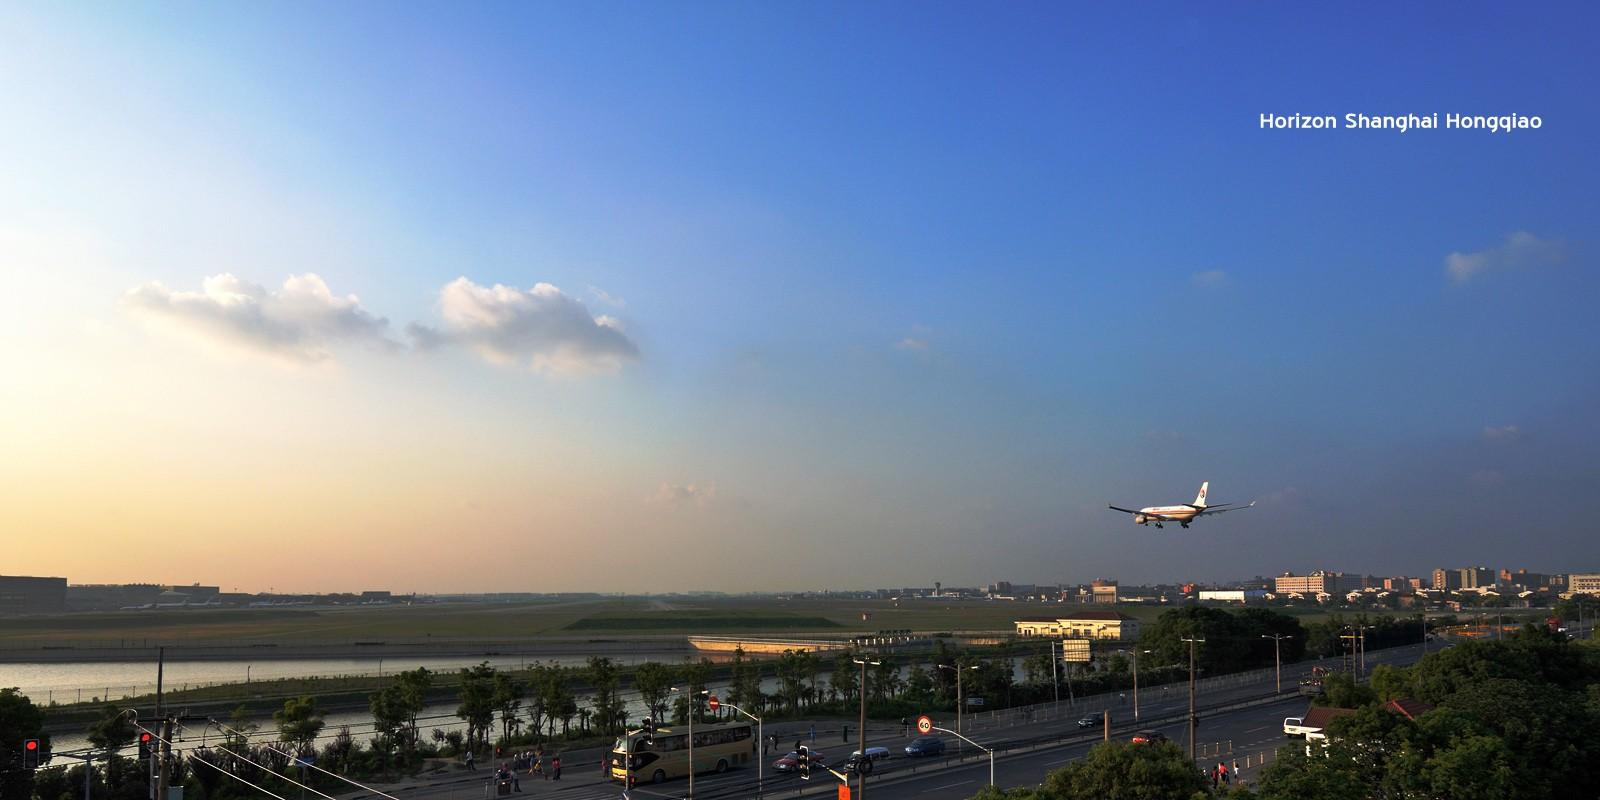 Re:[原创]人生就如同一架飞机…… AIRBUS A320-214 LAPD-34188 中国昆明巫家坝机场 中国上海虹桥机场